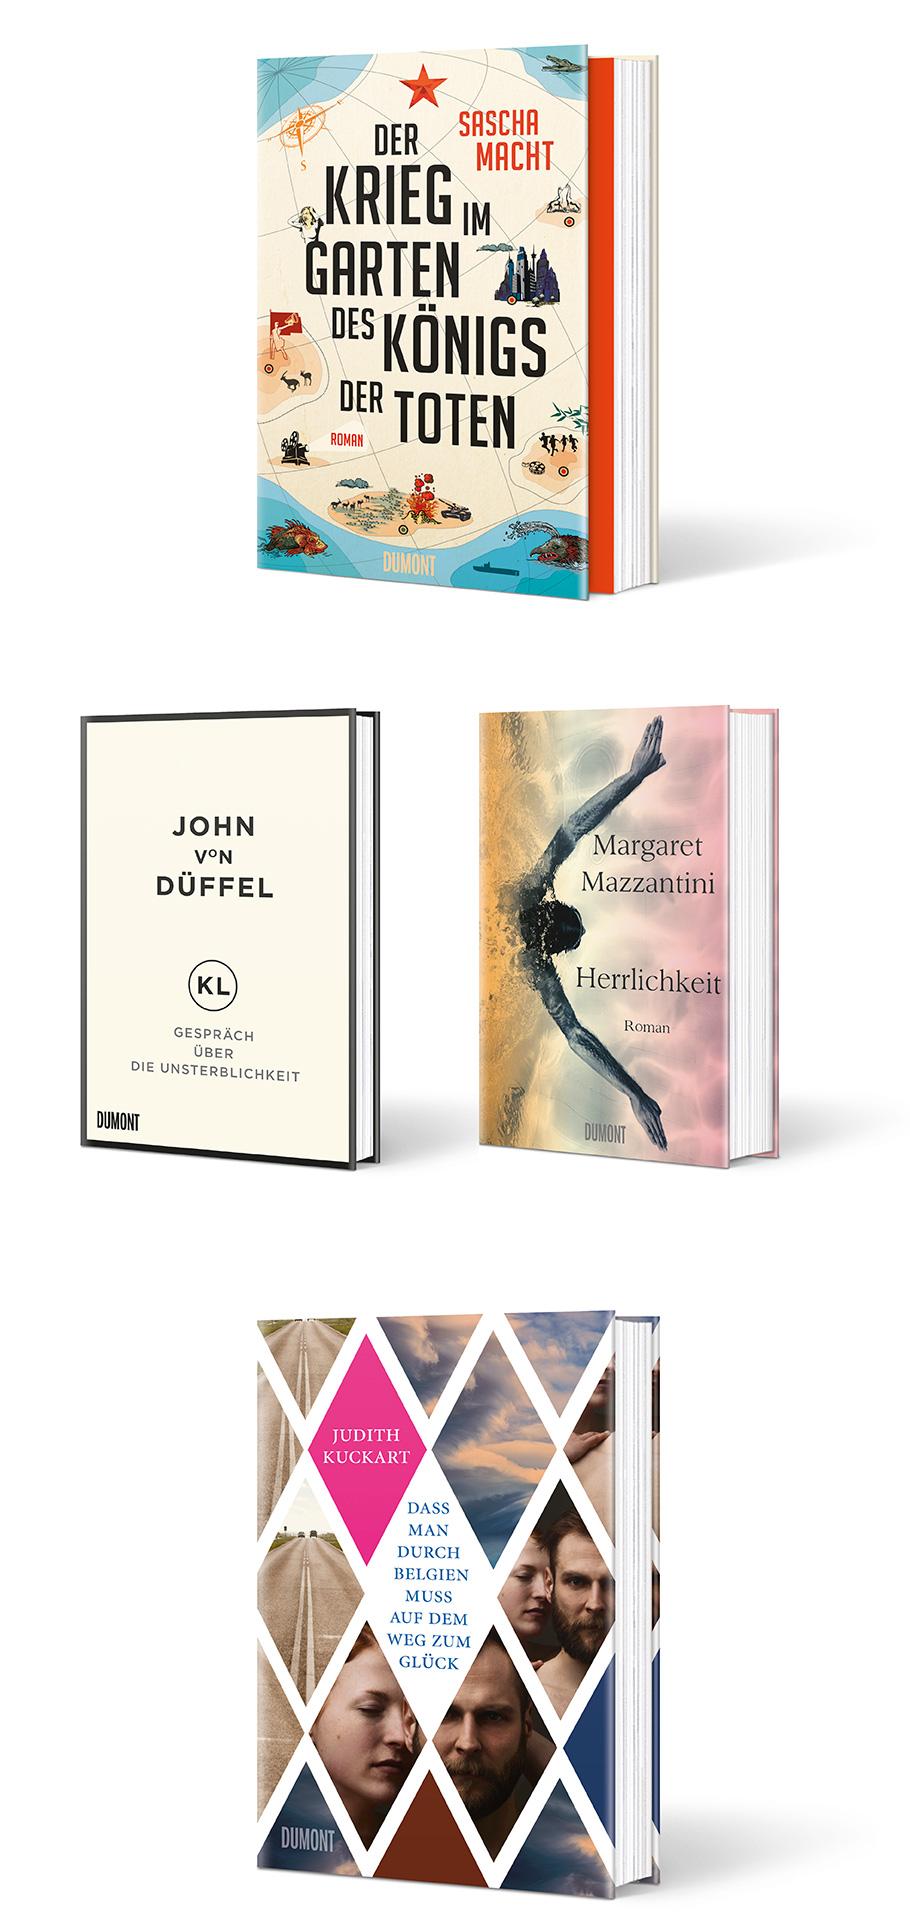 Buchcover Dumont Buchverlag